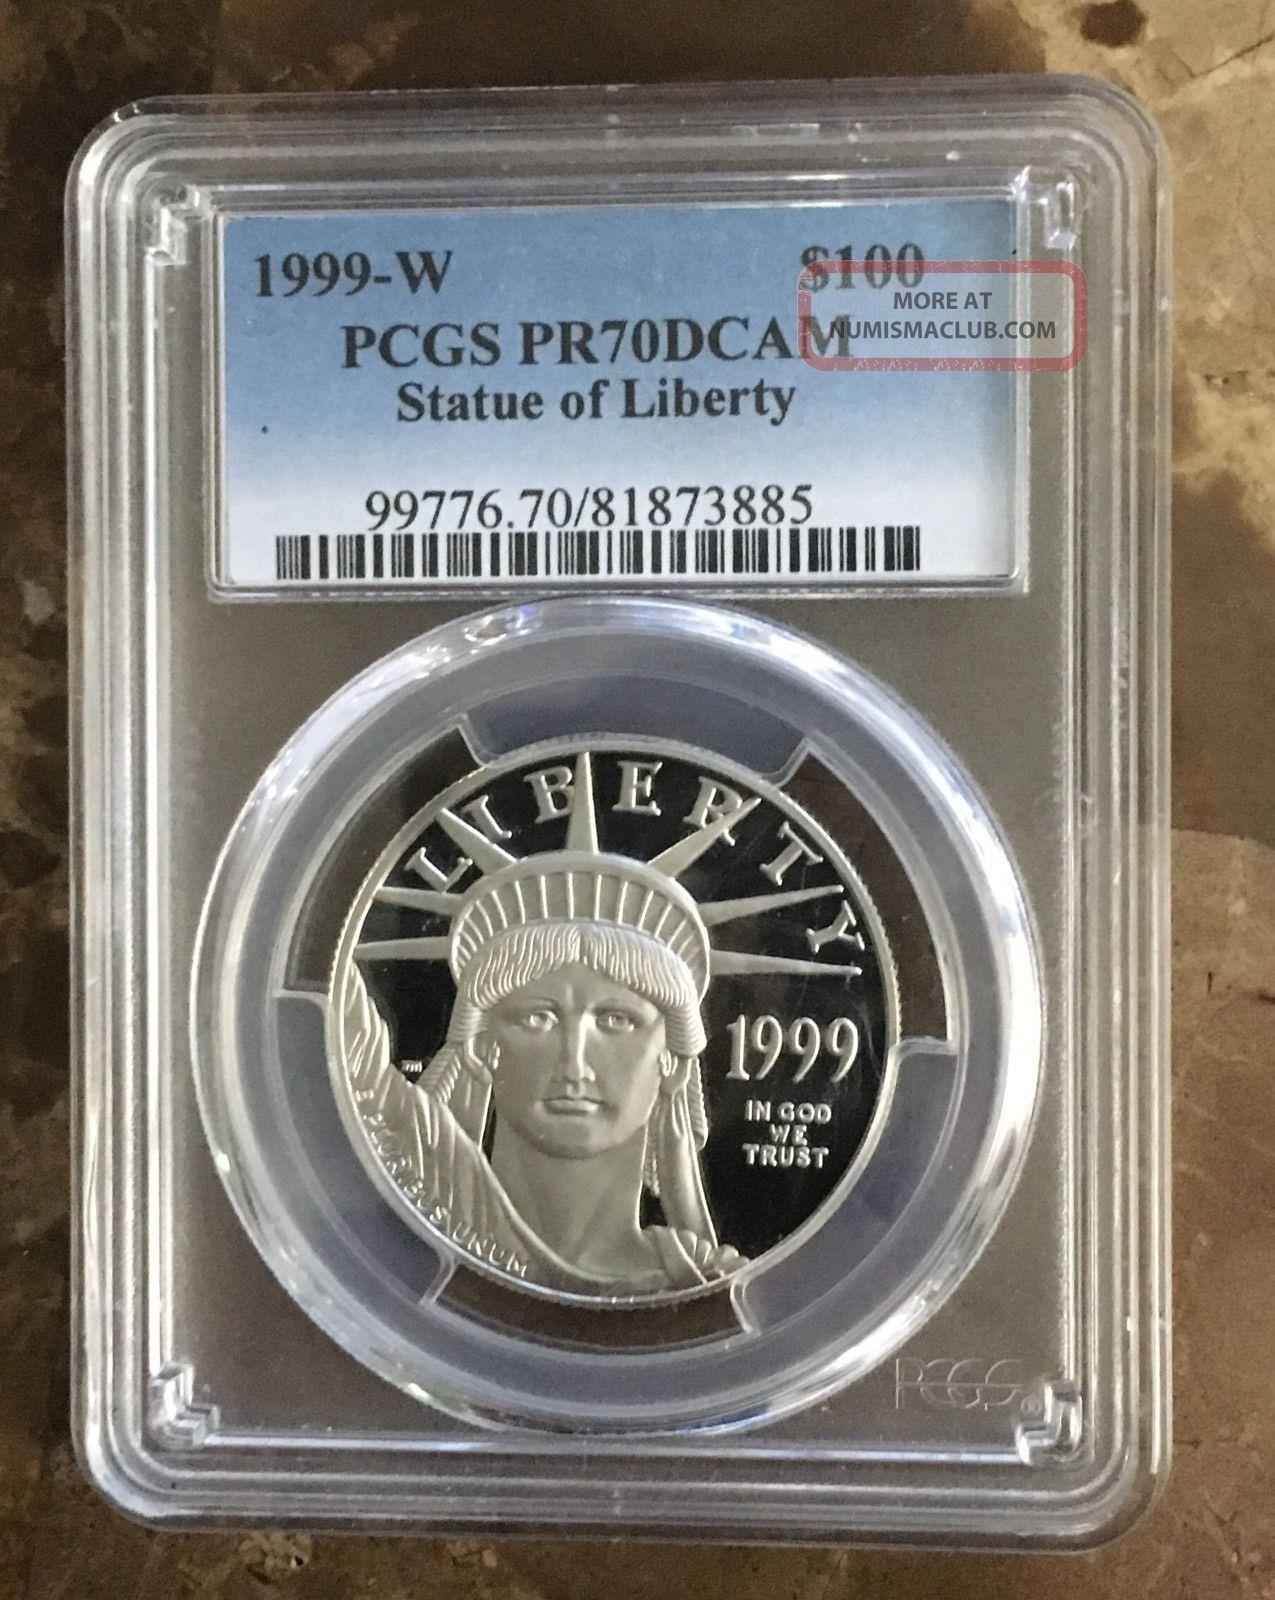 1999 Pcgs Pf70 $100 Platinum Eagle (1 Ounce Coin) Platinum photo